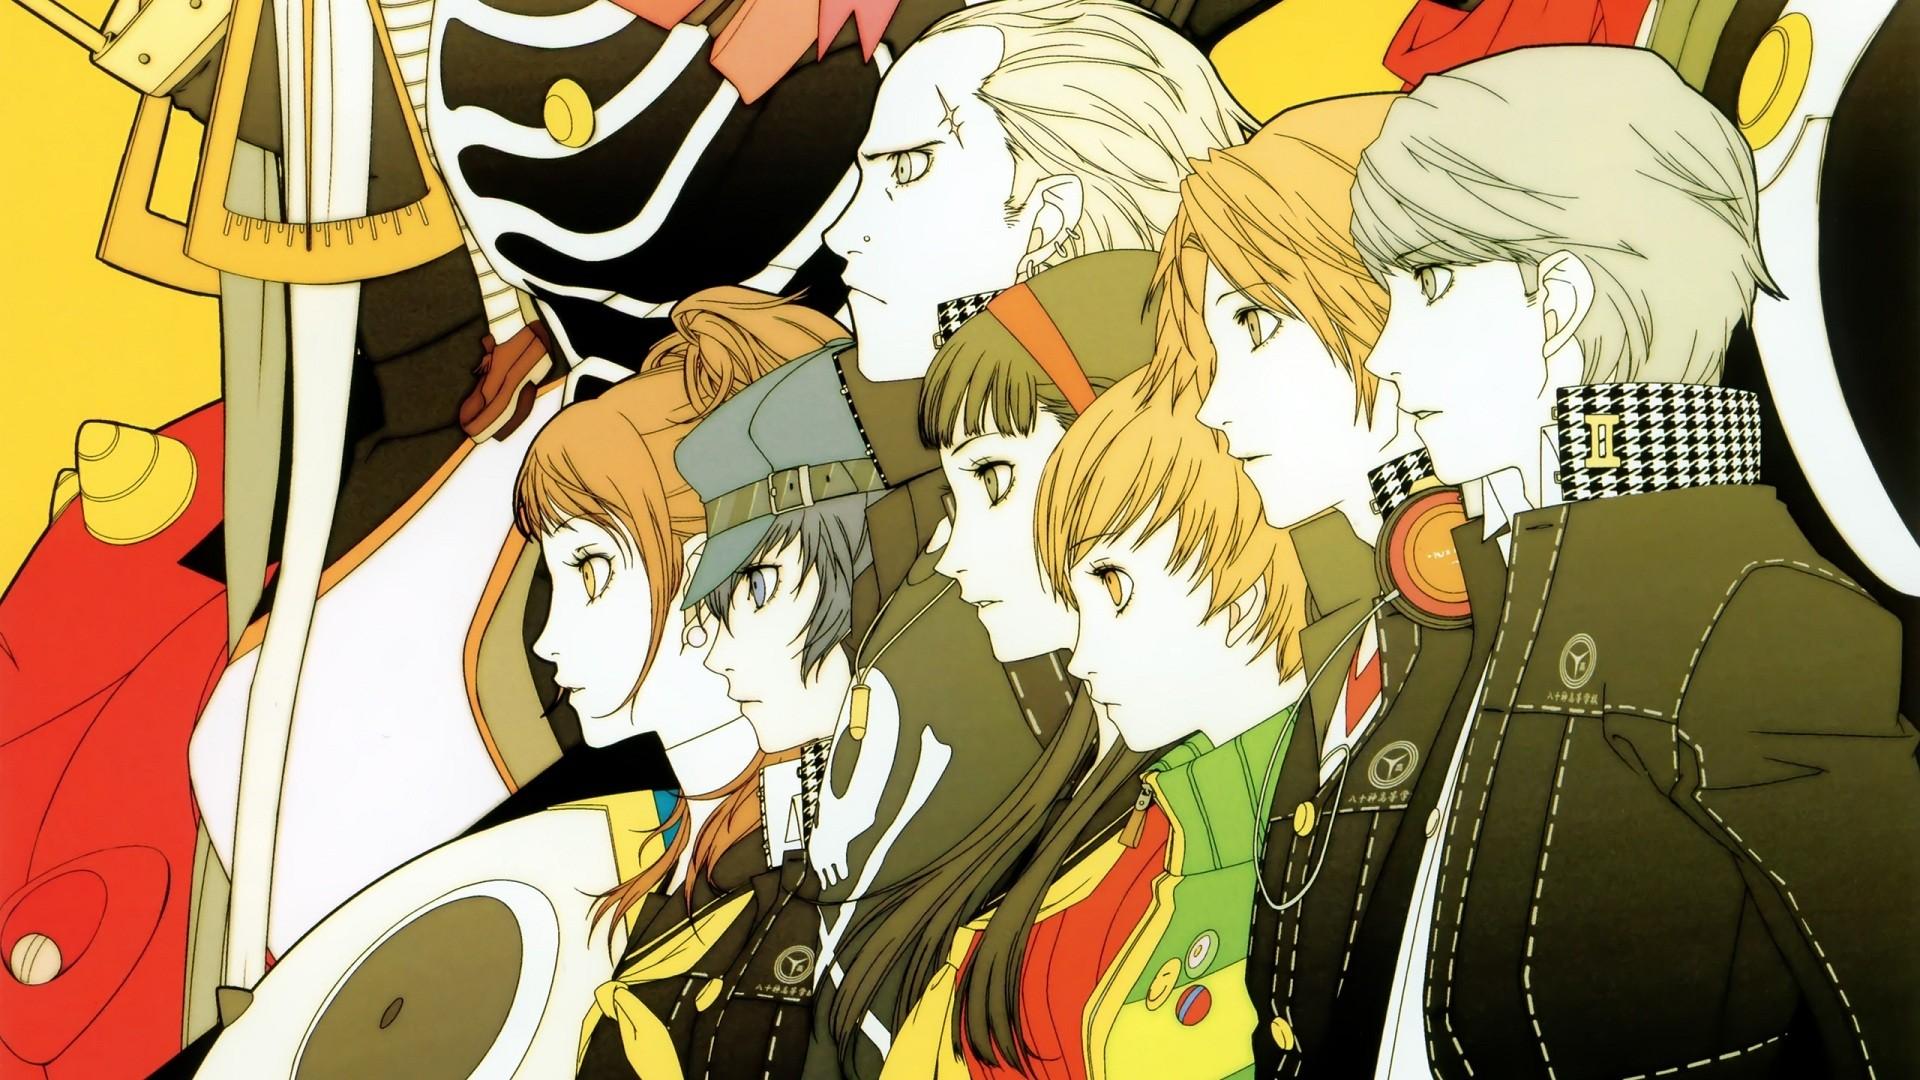 Persona 3 Fes Ps3 Theme Creator Feverpolar